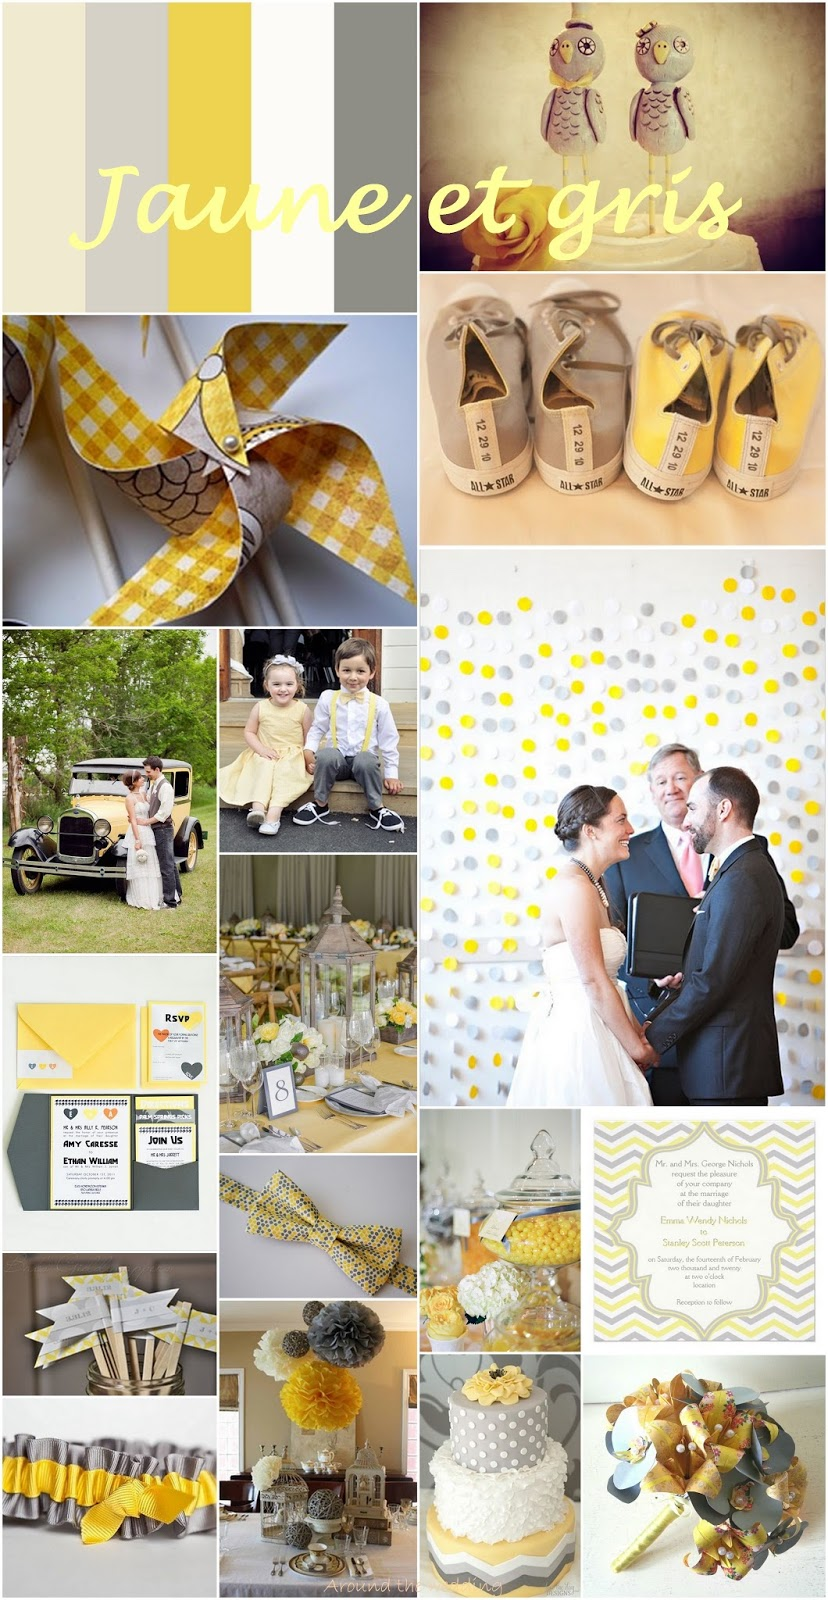 Around the wedding Couleur # jaune et gris